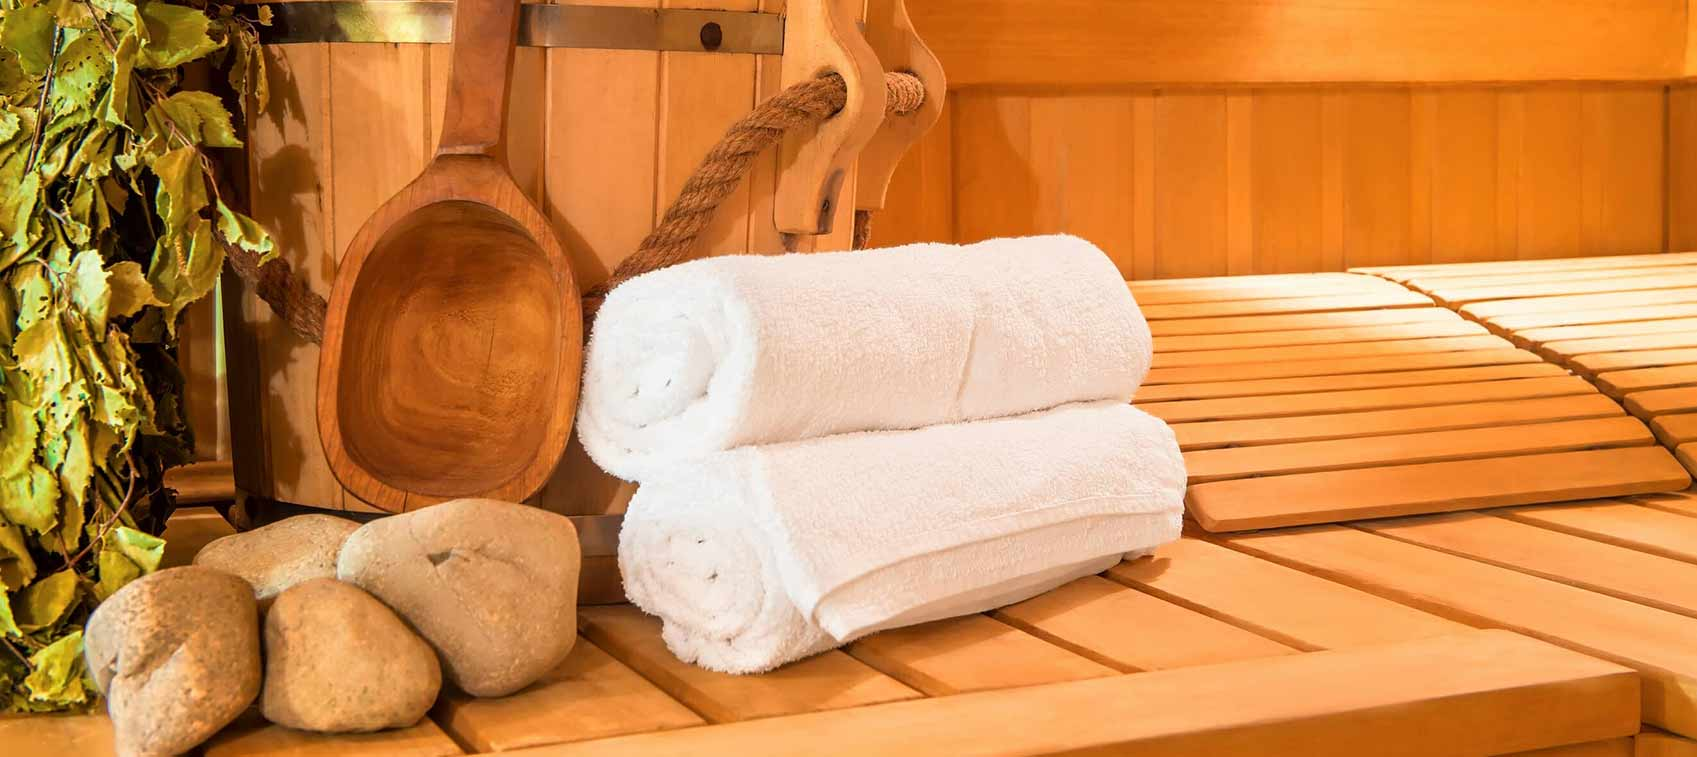 sauna ne işe yarar, saunanın faydaları